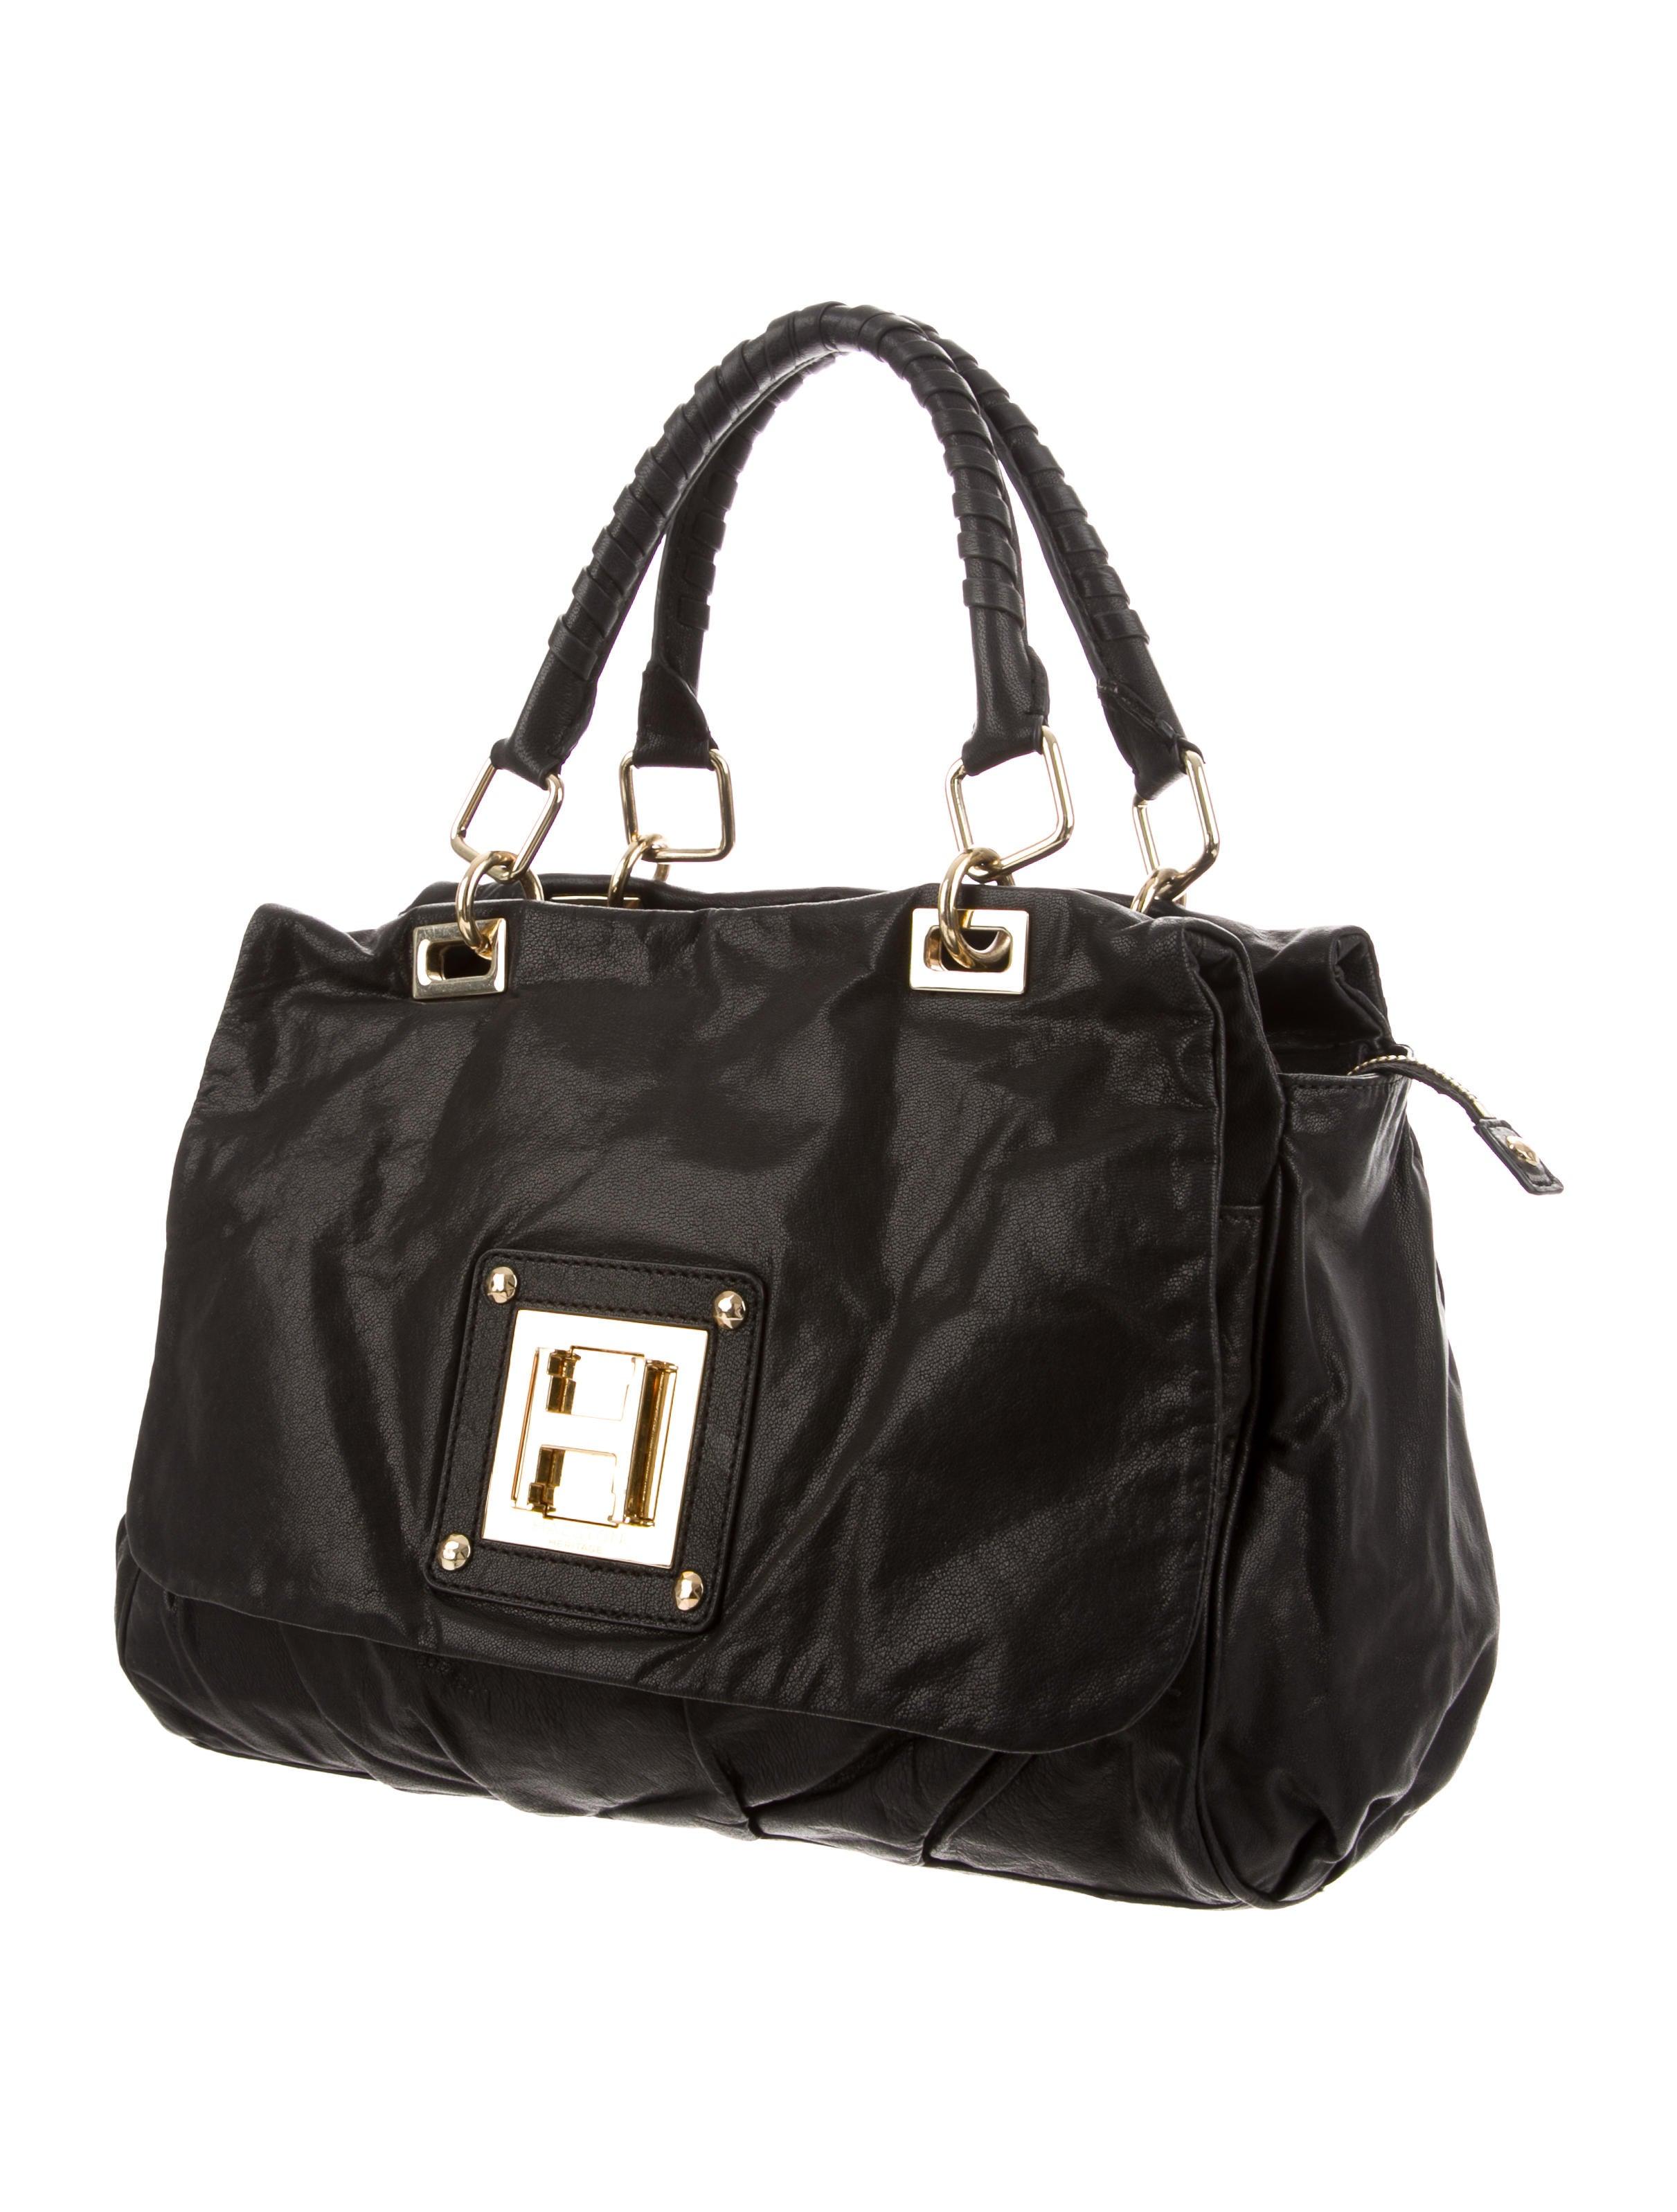 d2673c1613 Halston heritage medium leather tote handbags jpg 2422x3195 Halston heritage  handbags